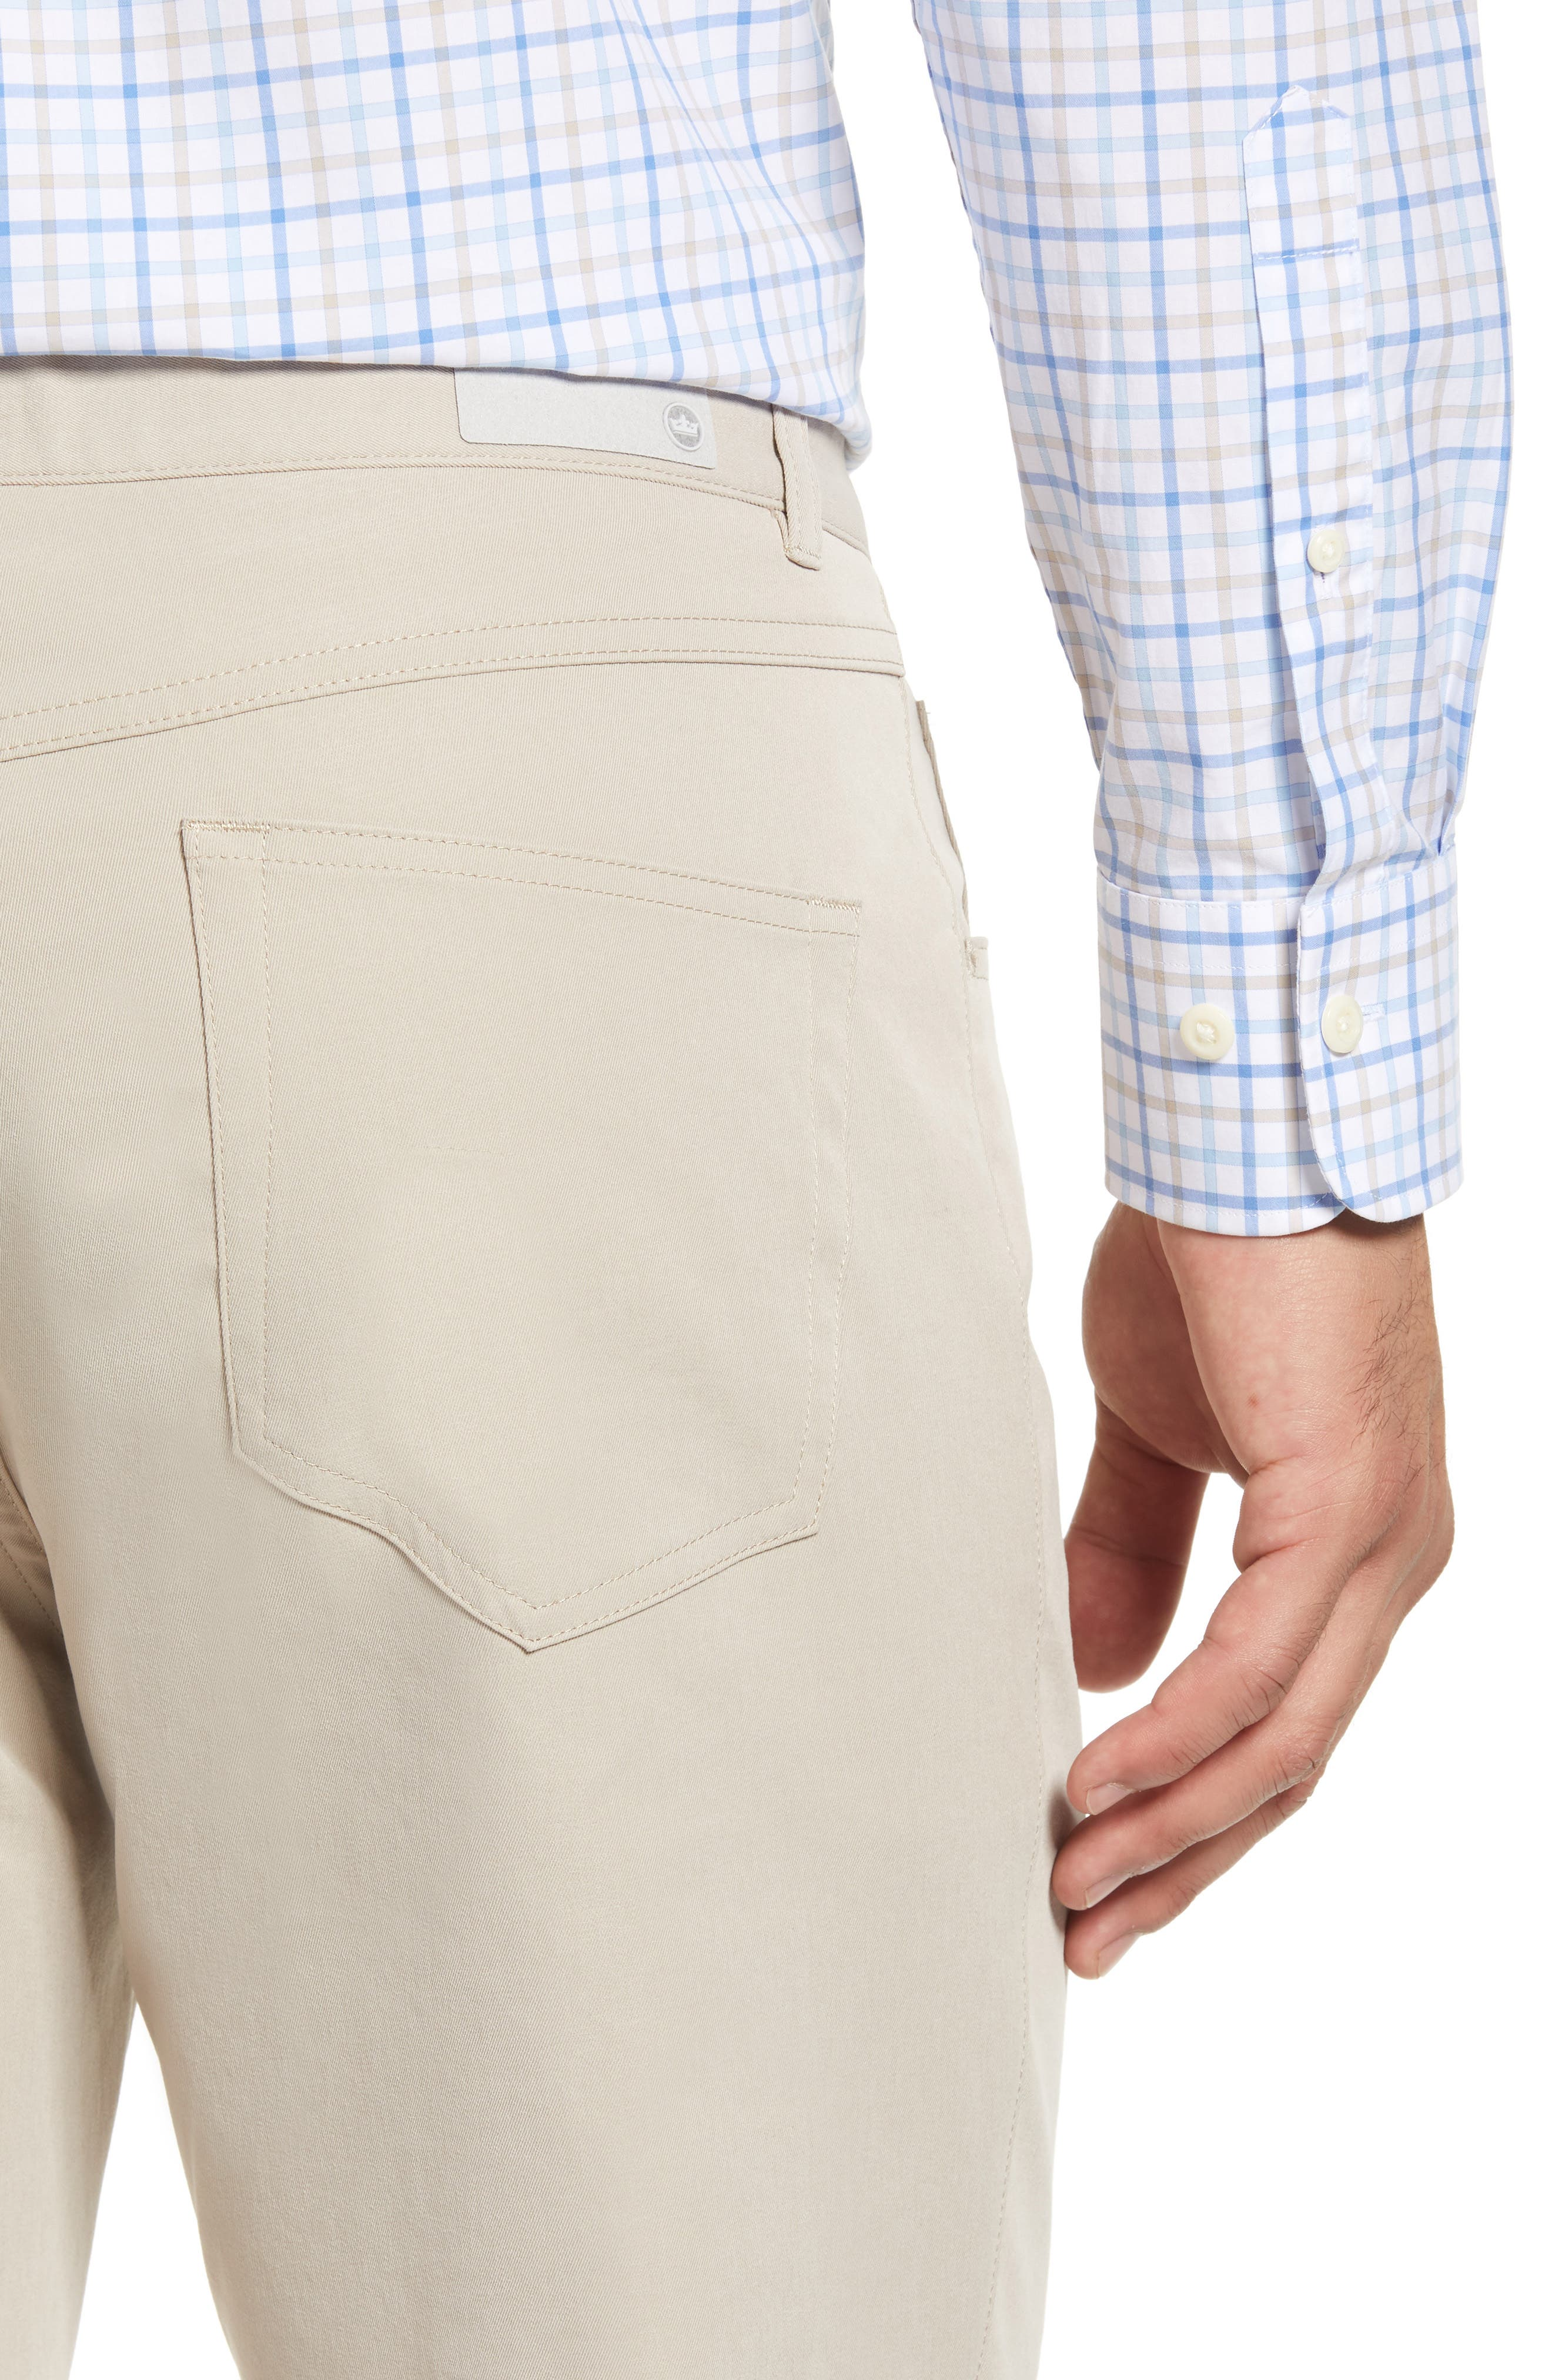 eb66 Regular Fit Performance Pants,                             Alternate thumbnail 4, color,                             BEIGE